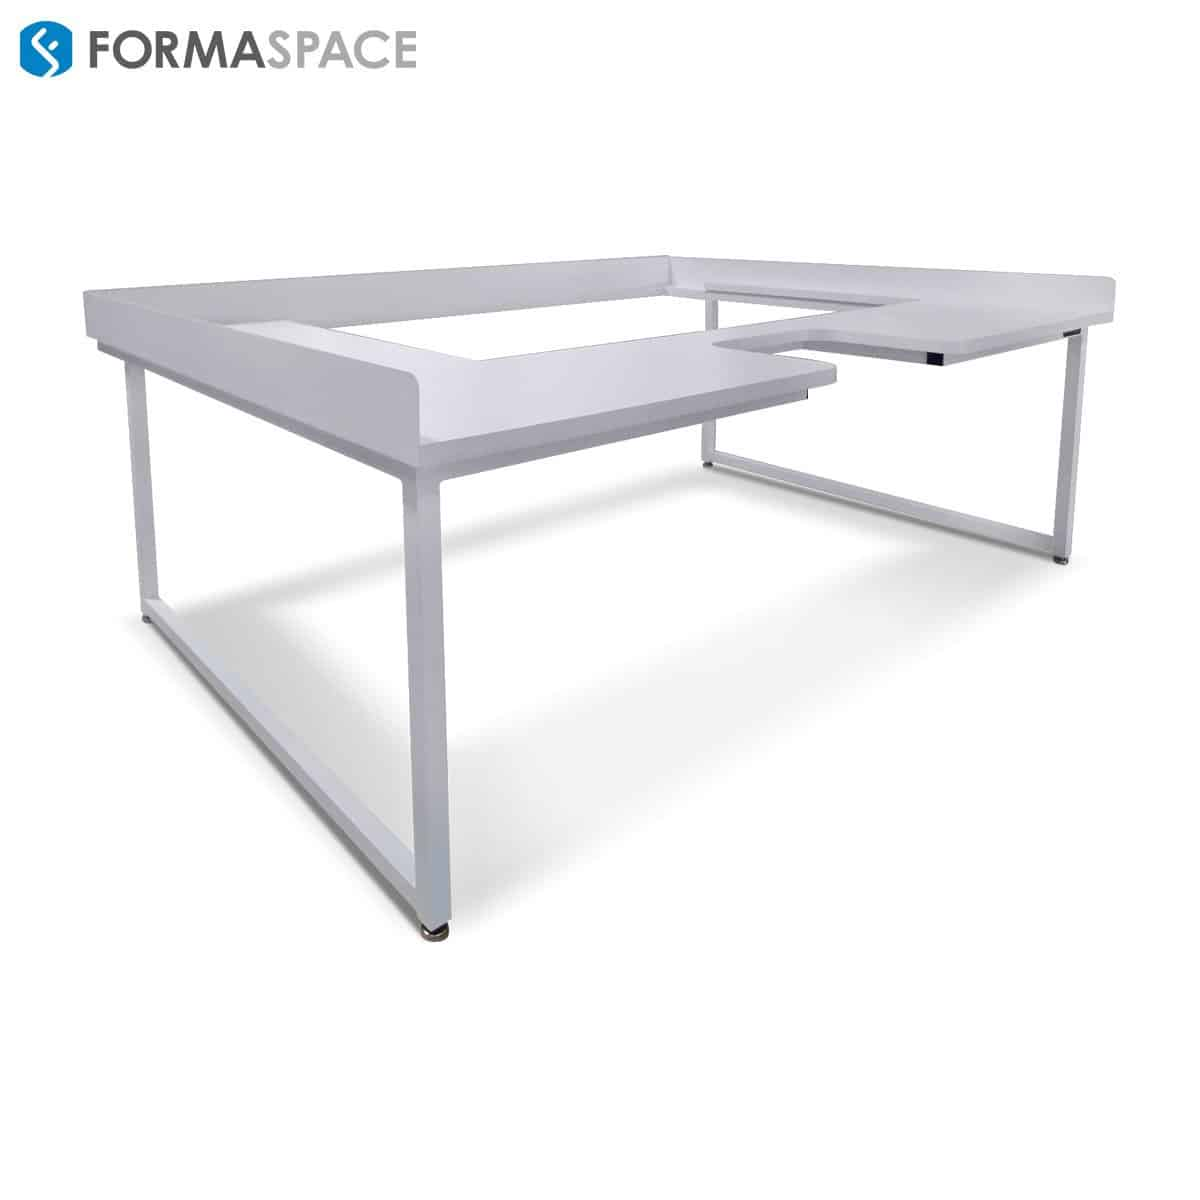 96 x 60 custom white workbench